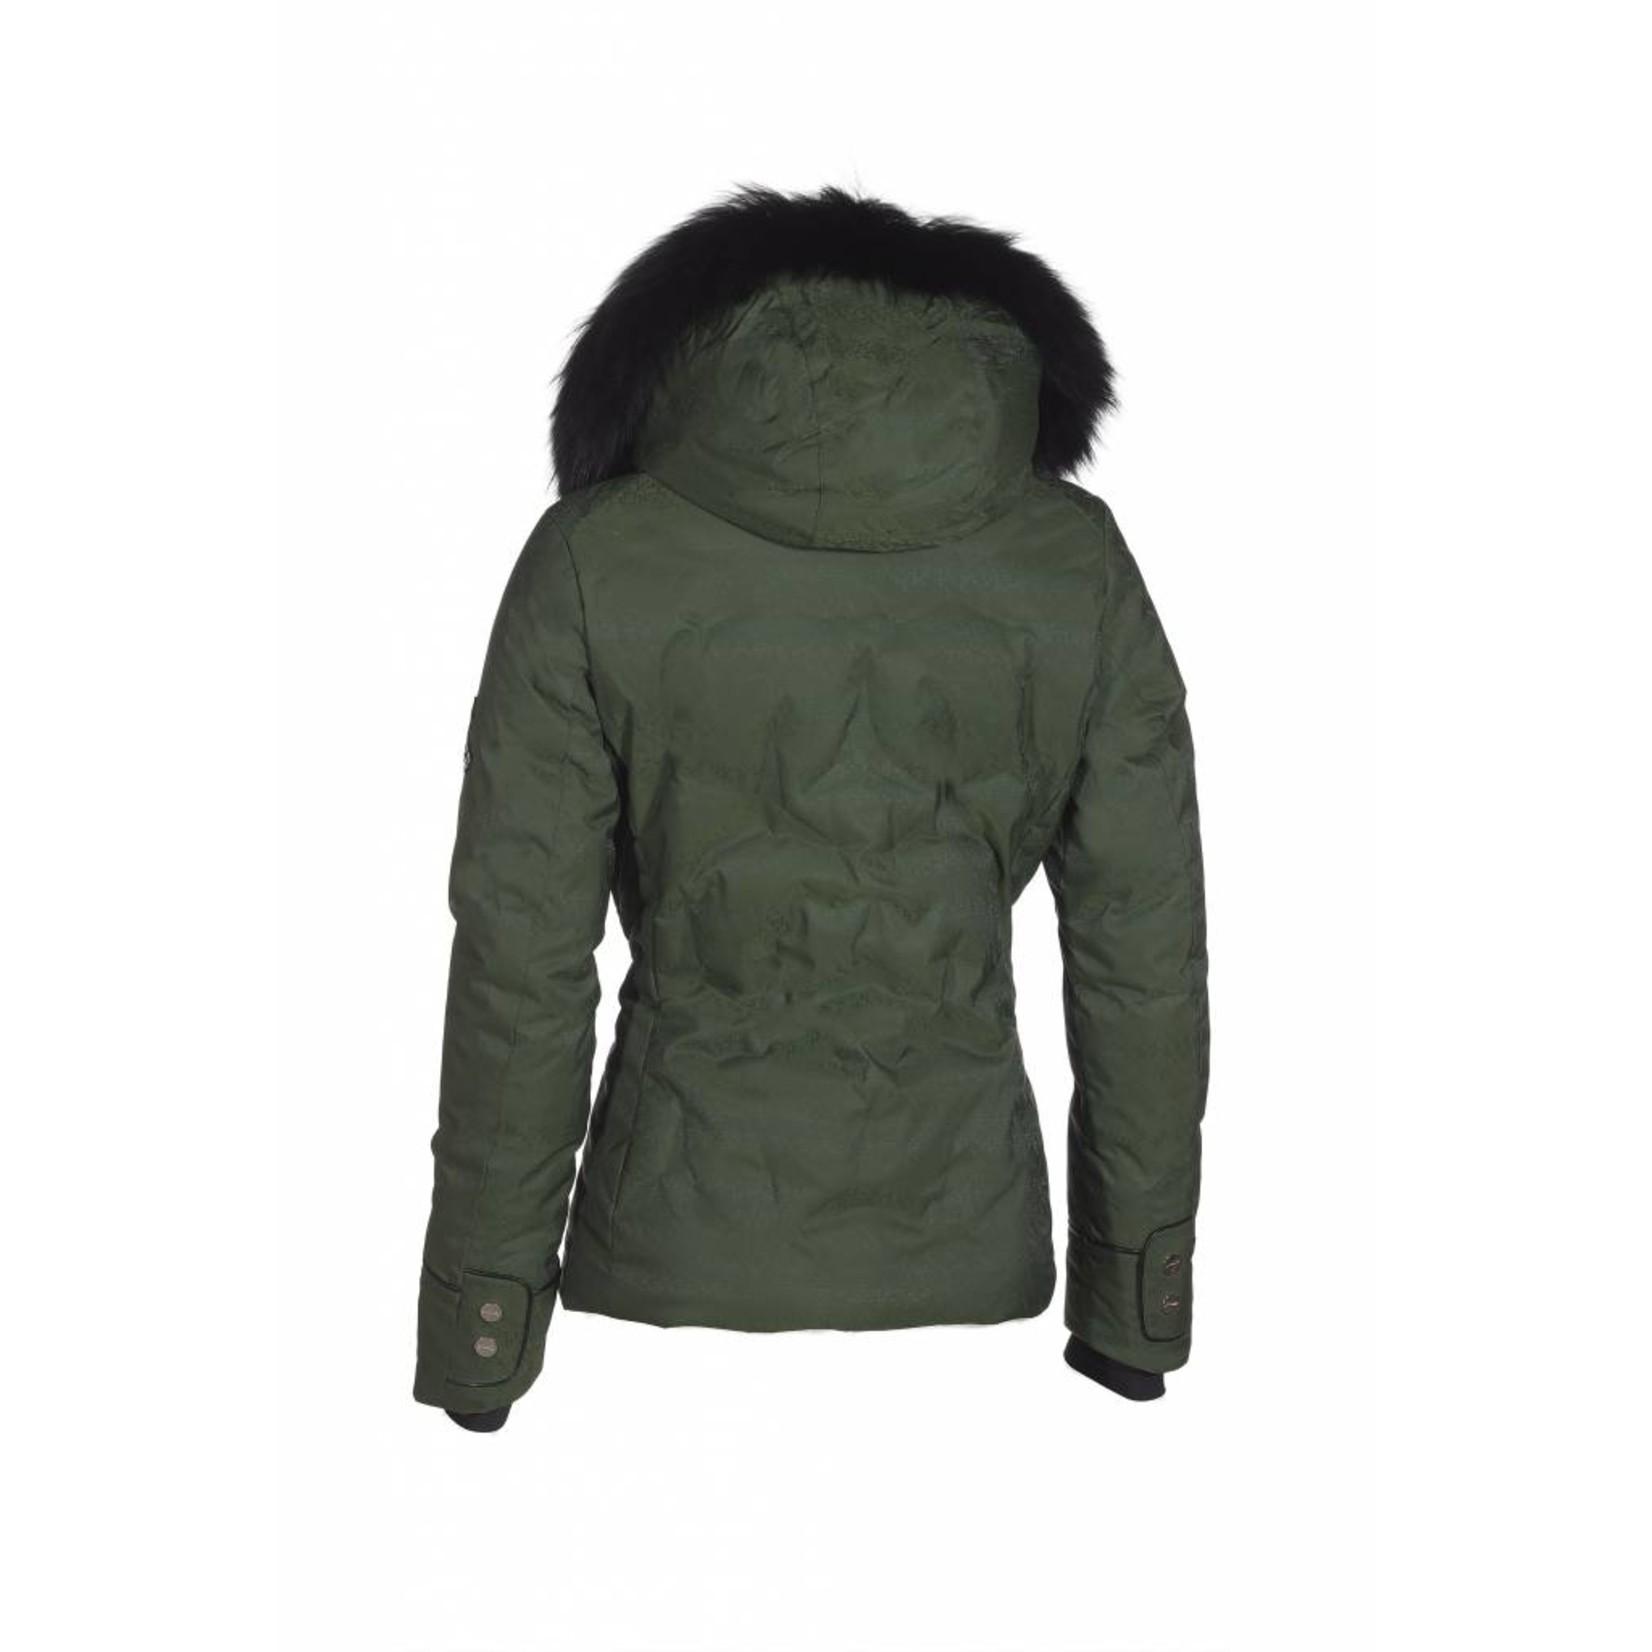 PHENIX Rose Jacket - R/DG